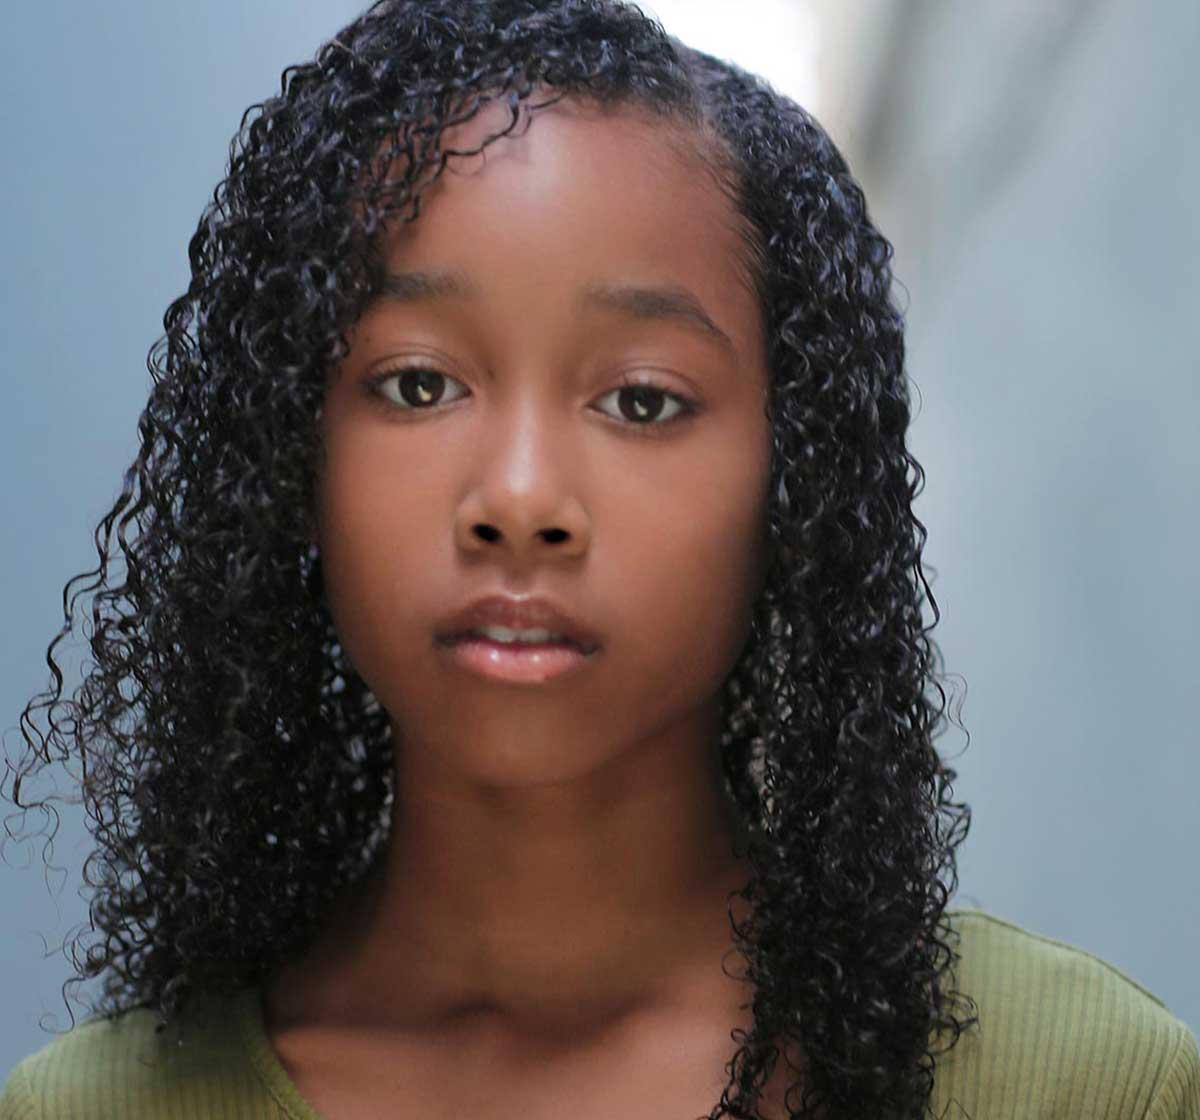 Kayia Lewis